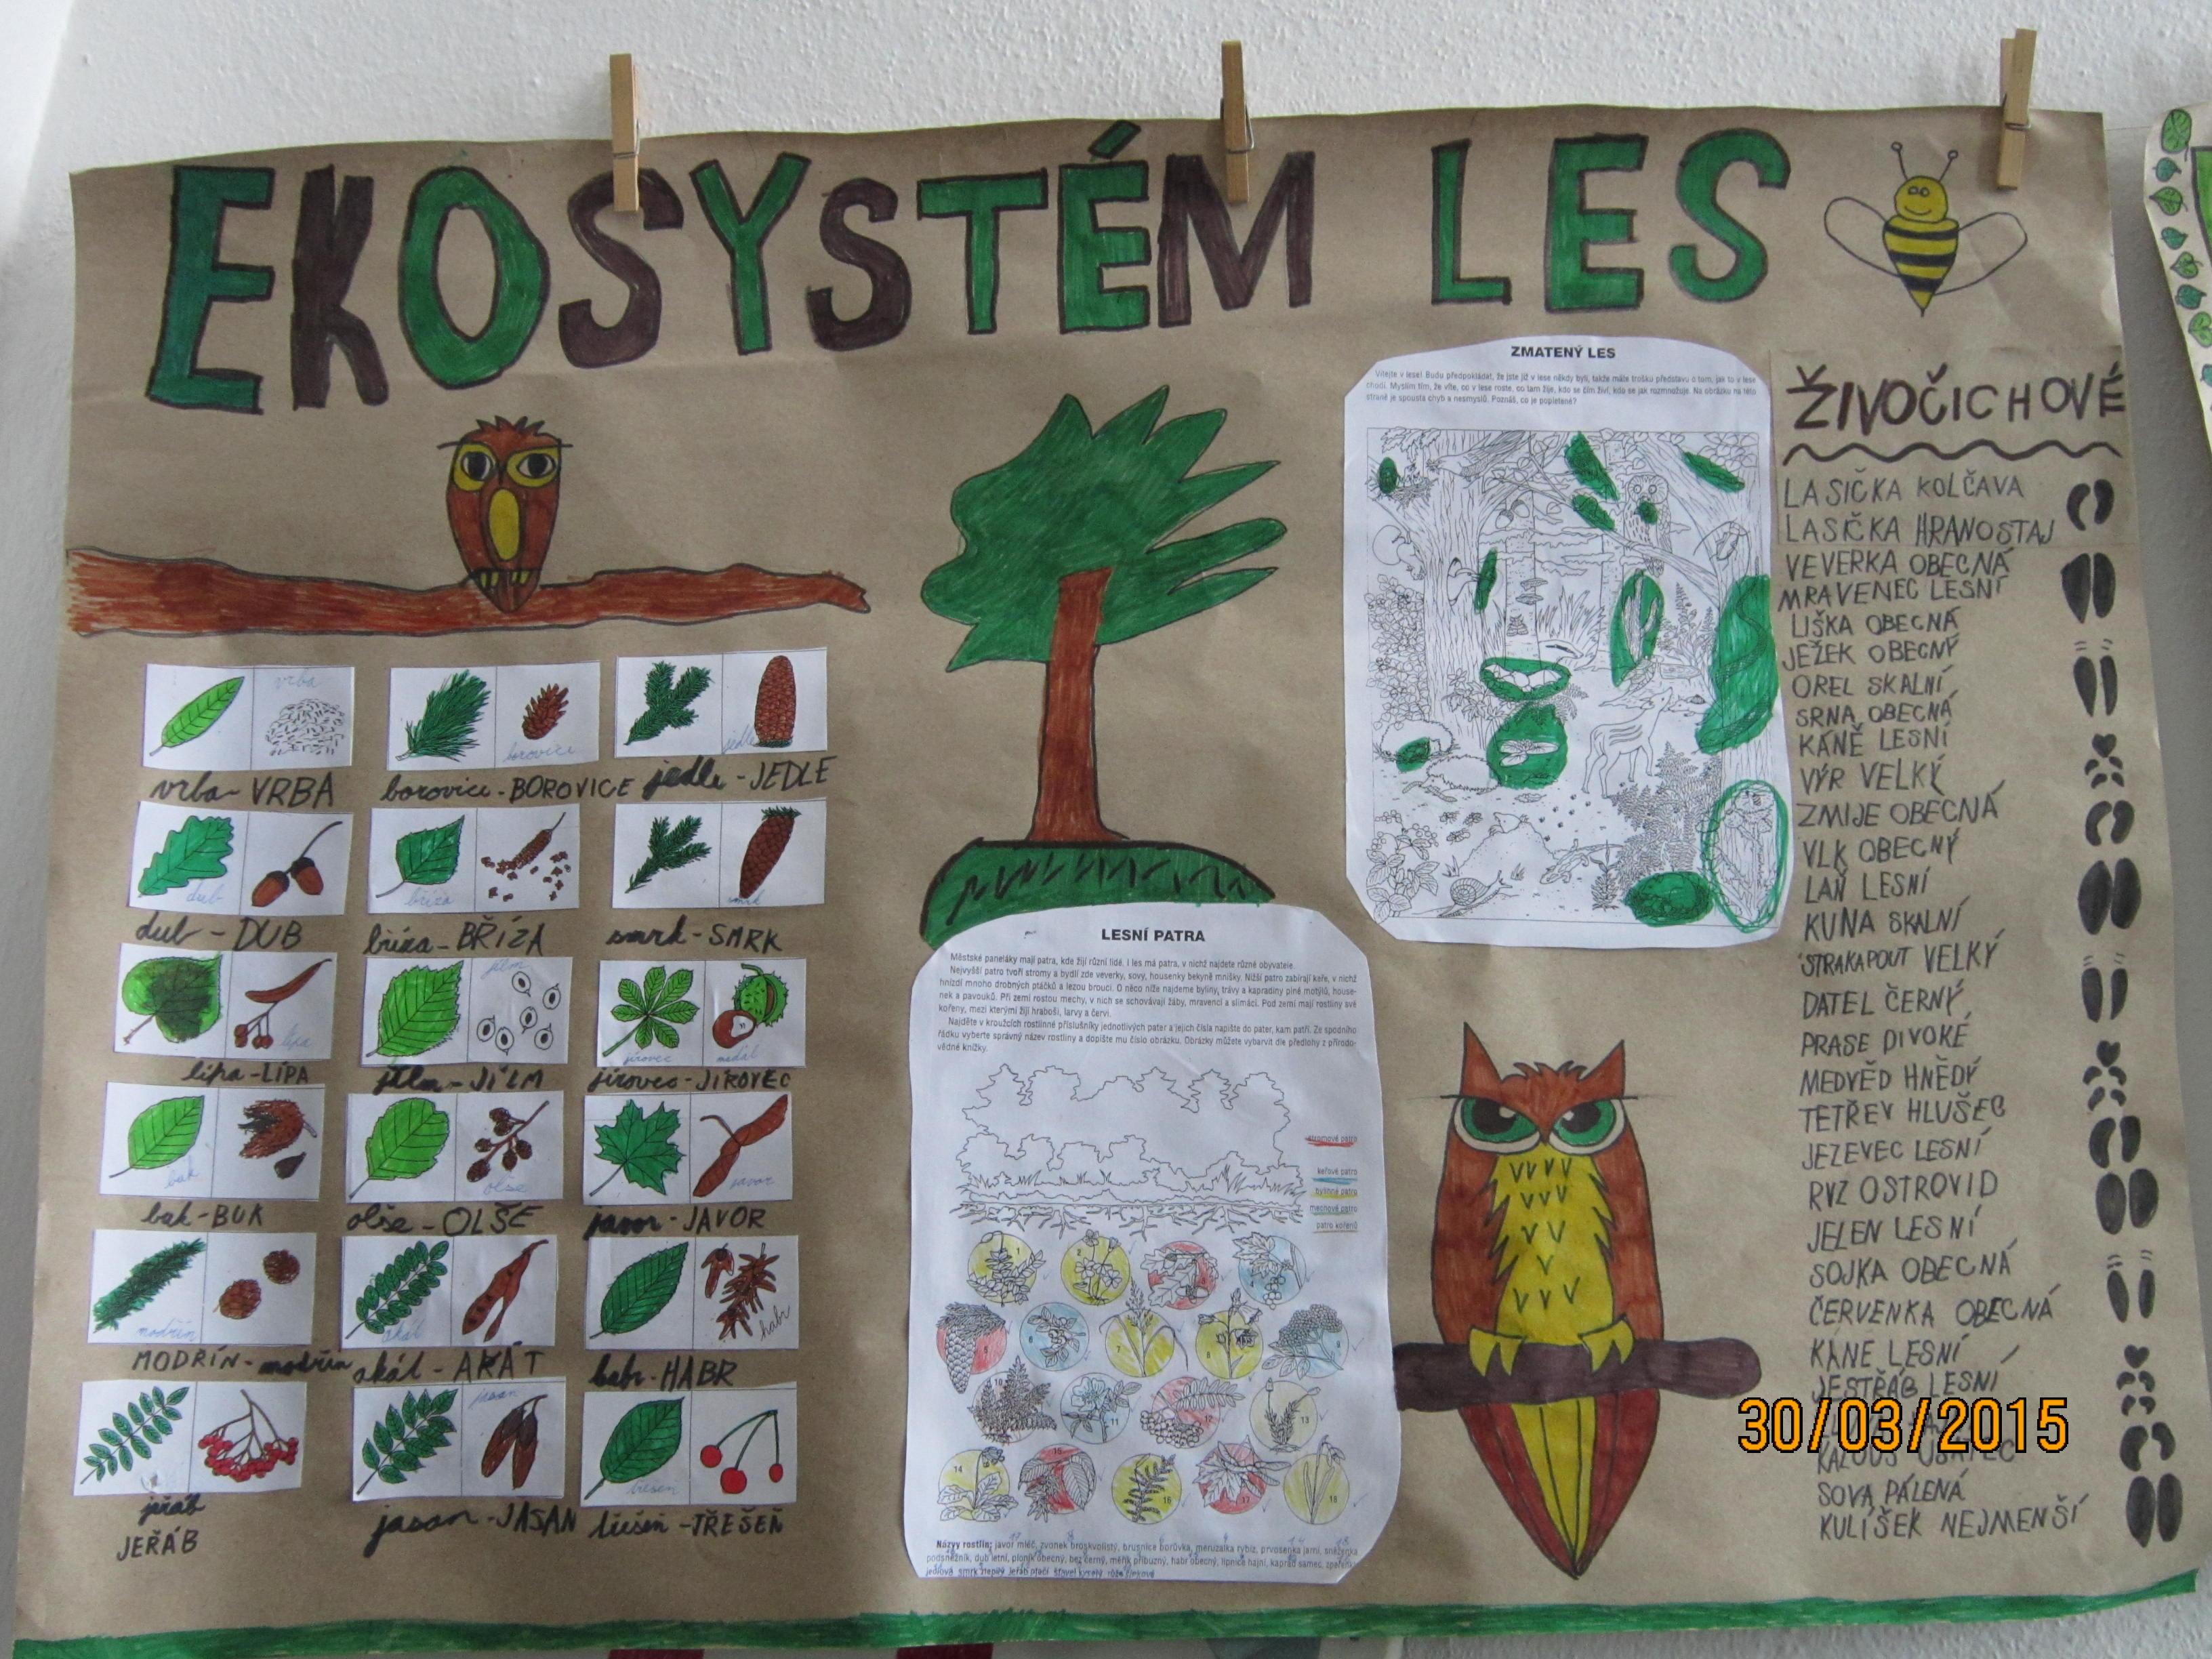 Hura Do Lesa Projekt Lesni Ekosystem Zakladni Skola Stare Mesto